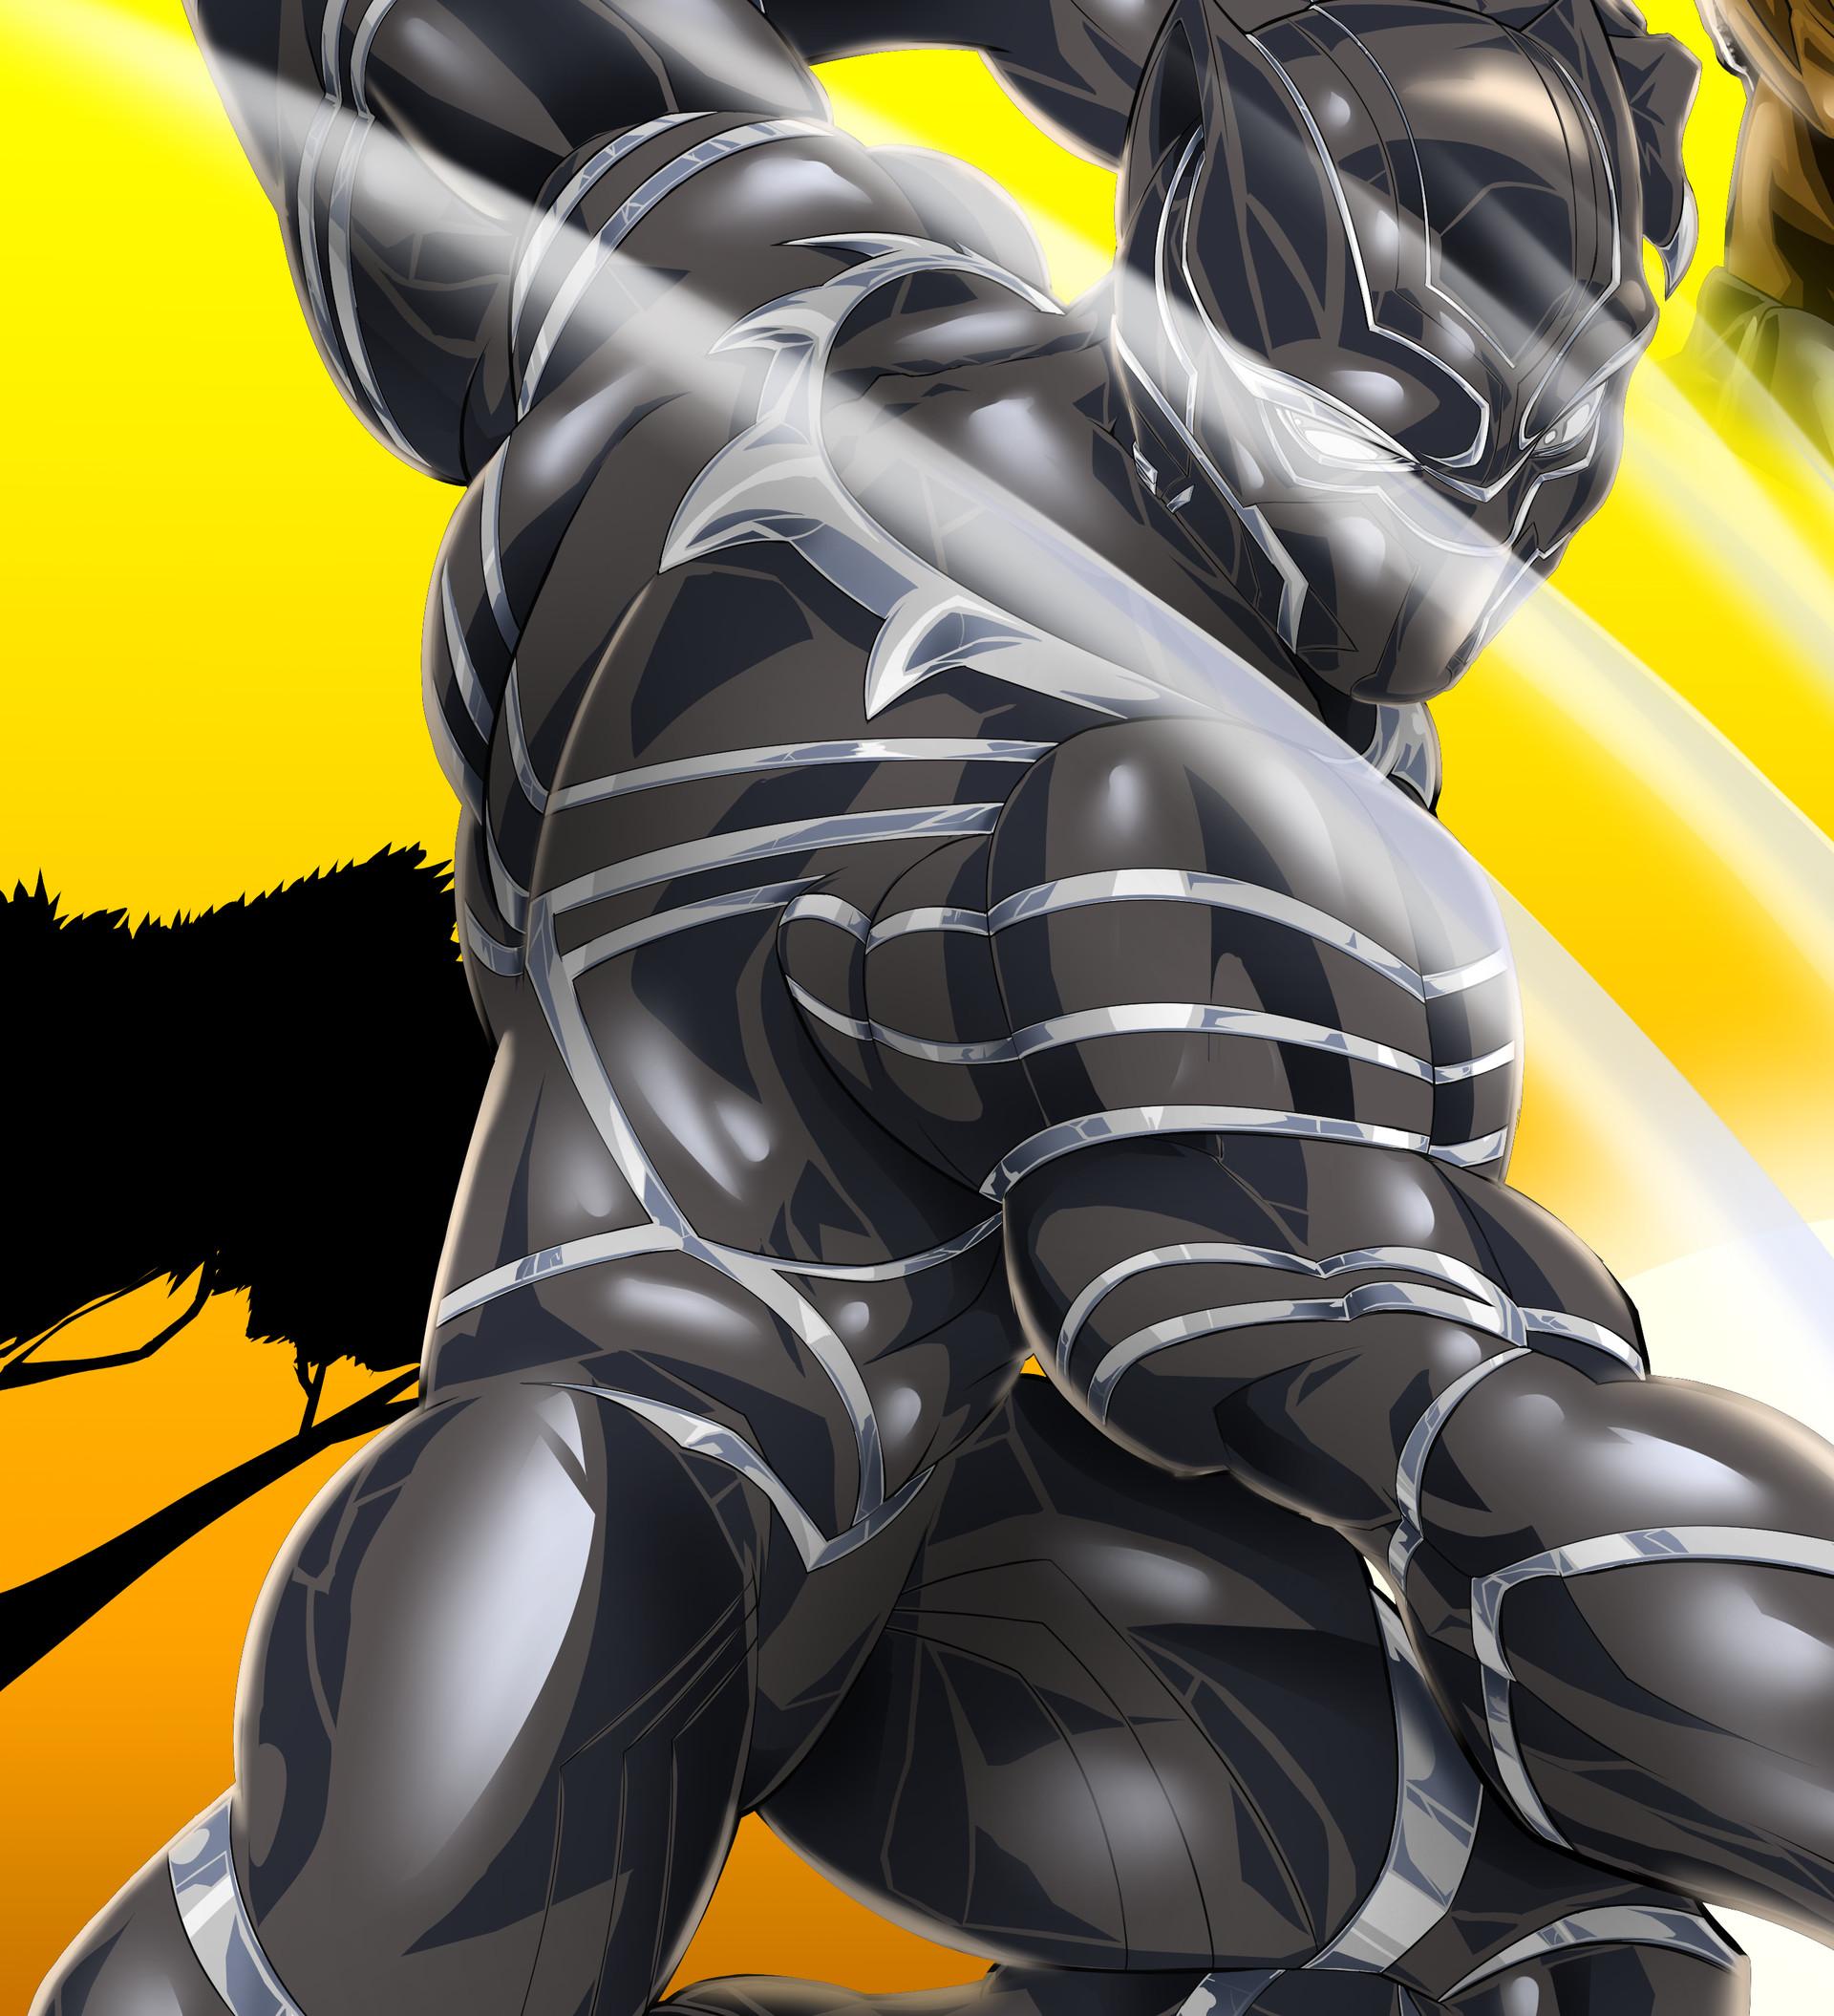 Robert e wilson black panther 4